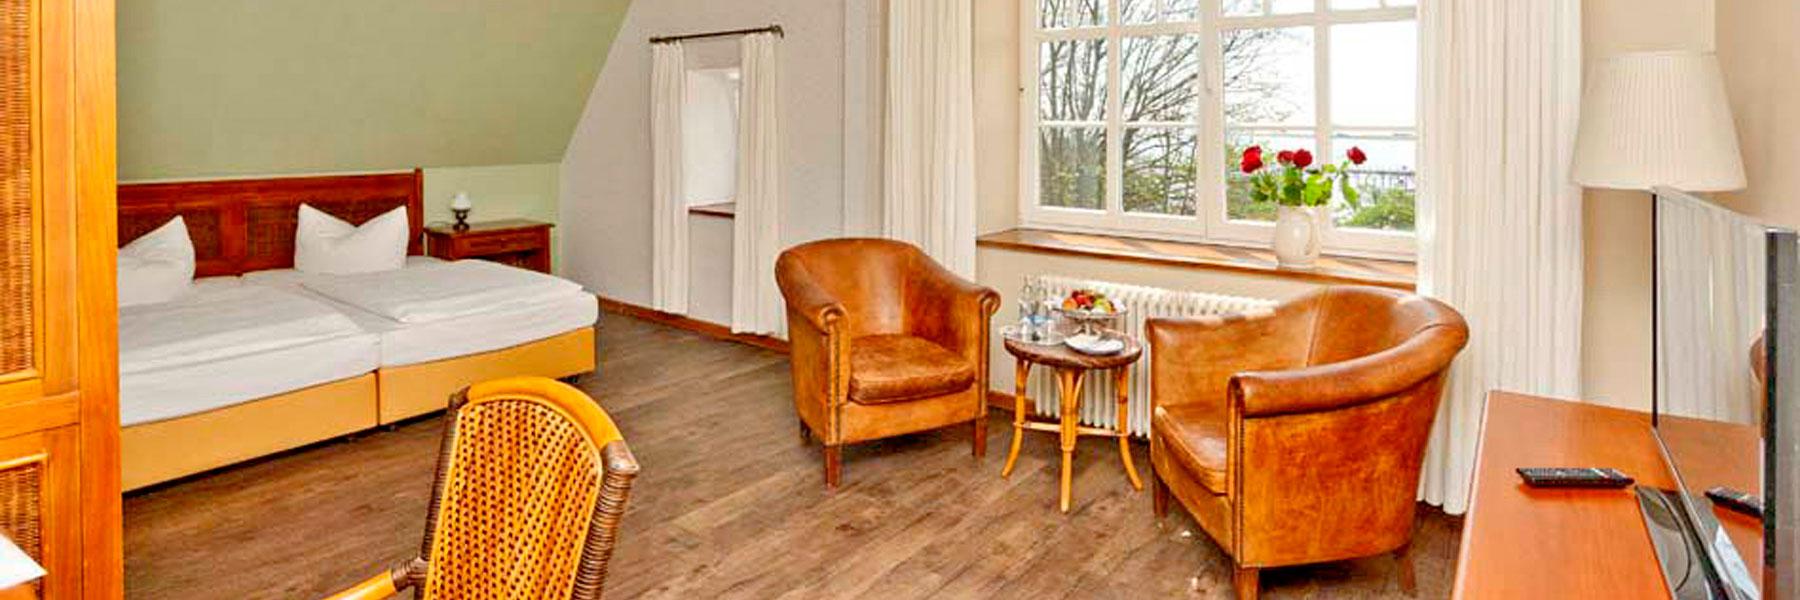 Zimmer - Hotel Hitthim